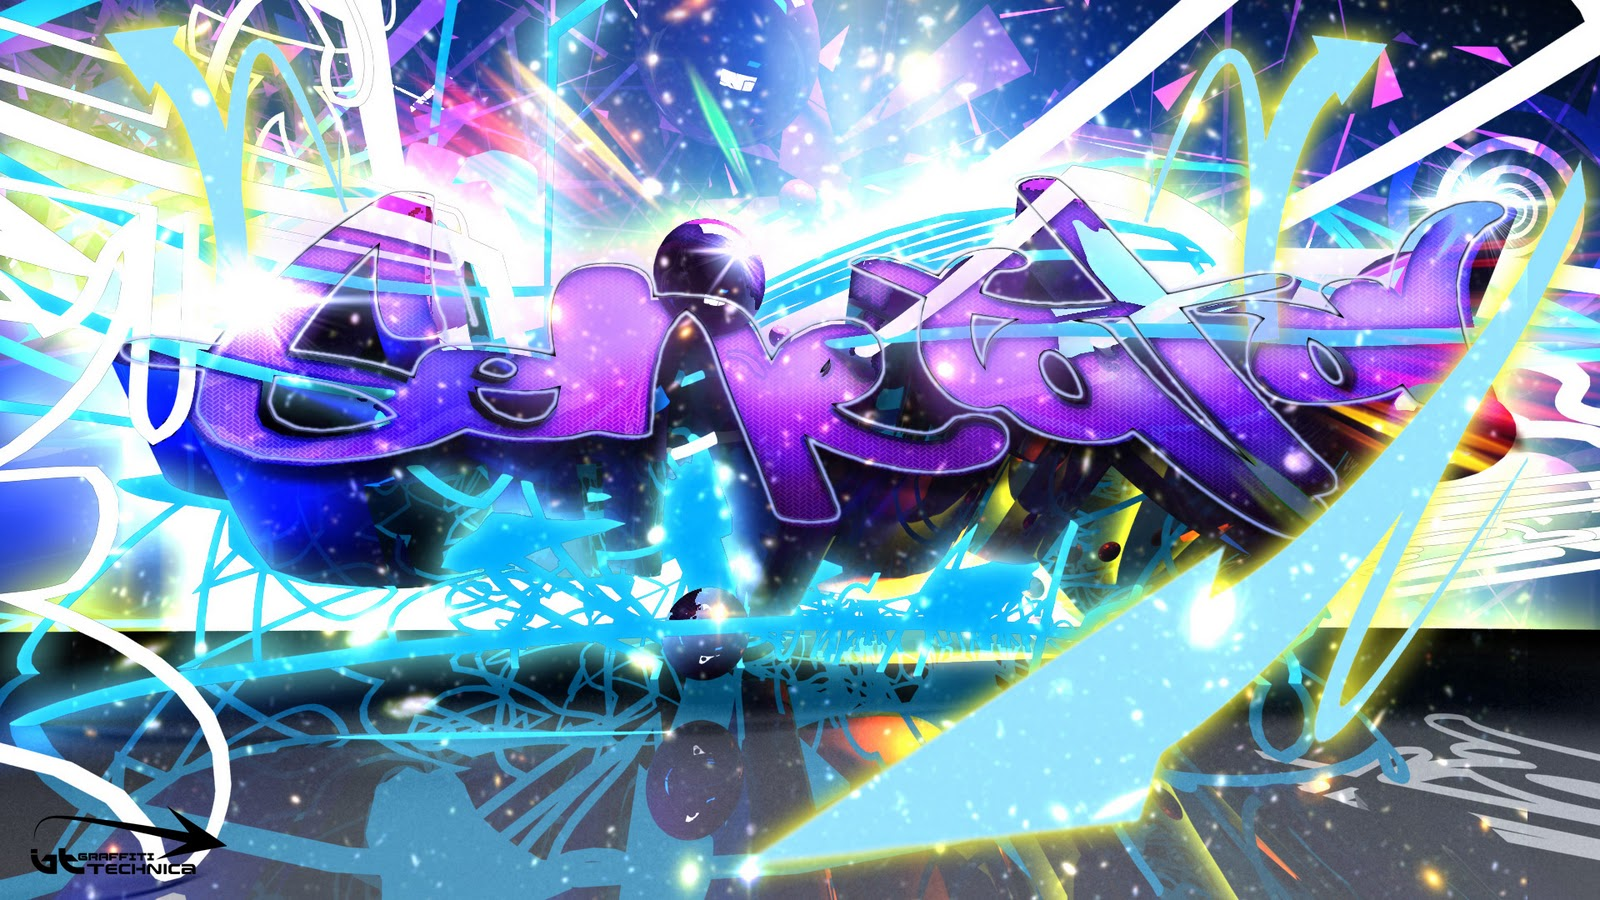 Amazing graffiti art background design